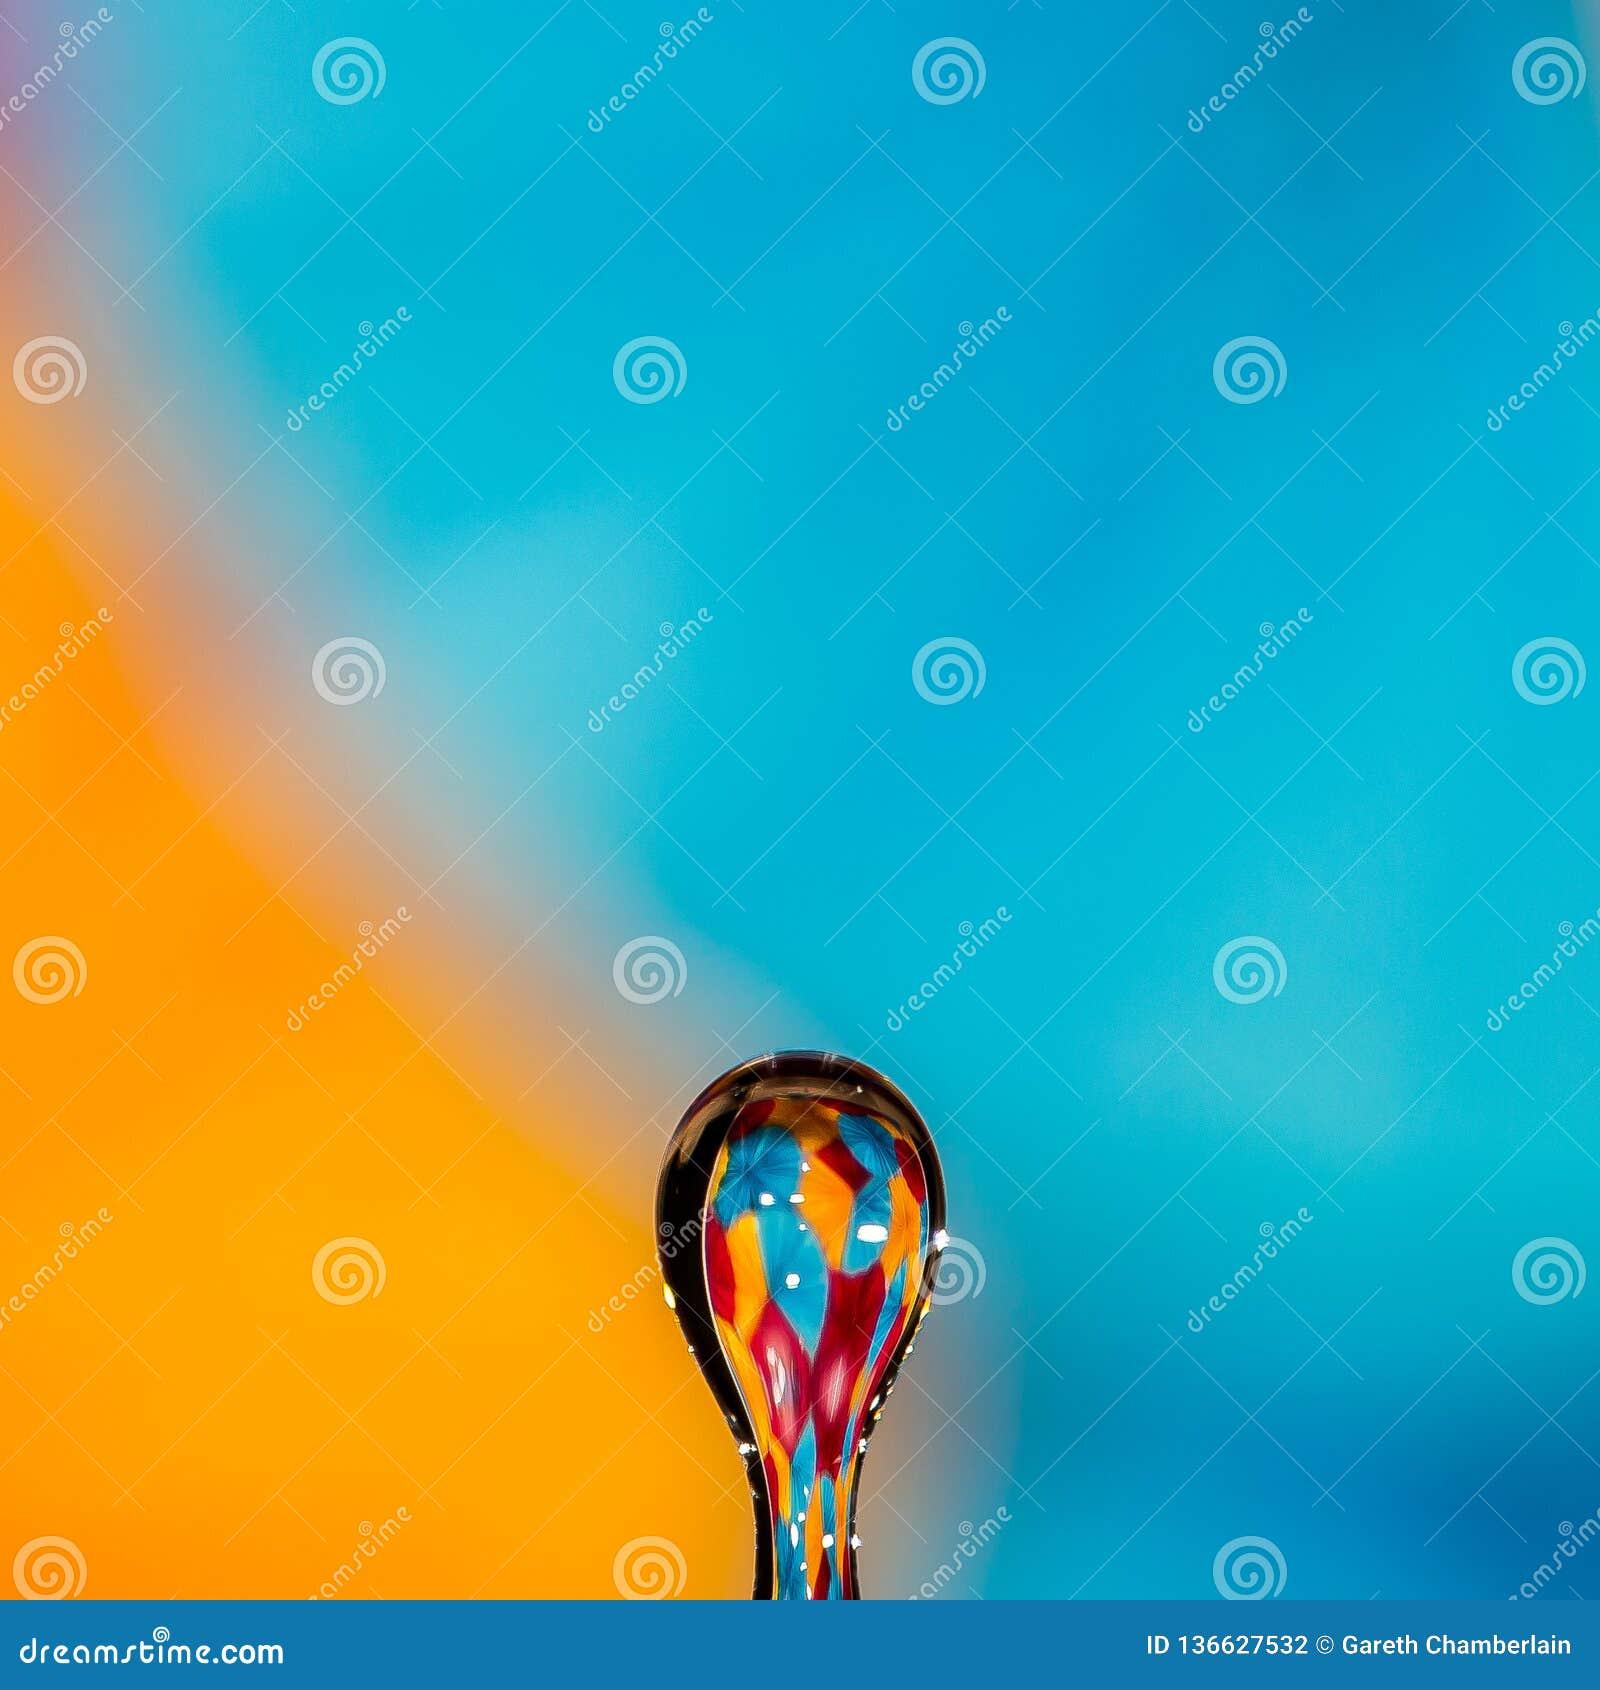 The water drop balloon - studio